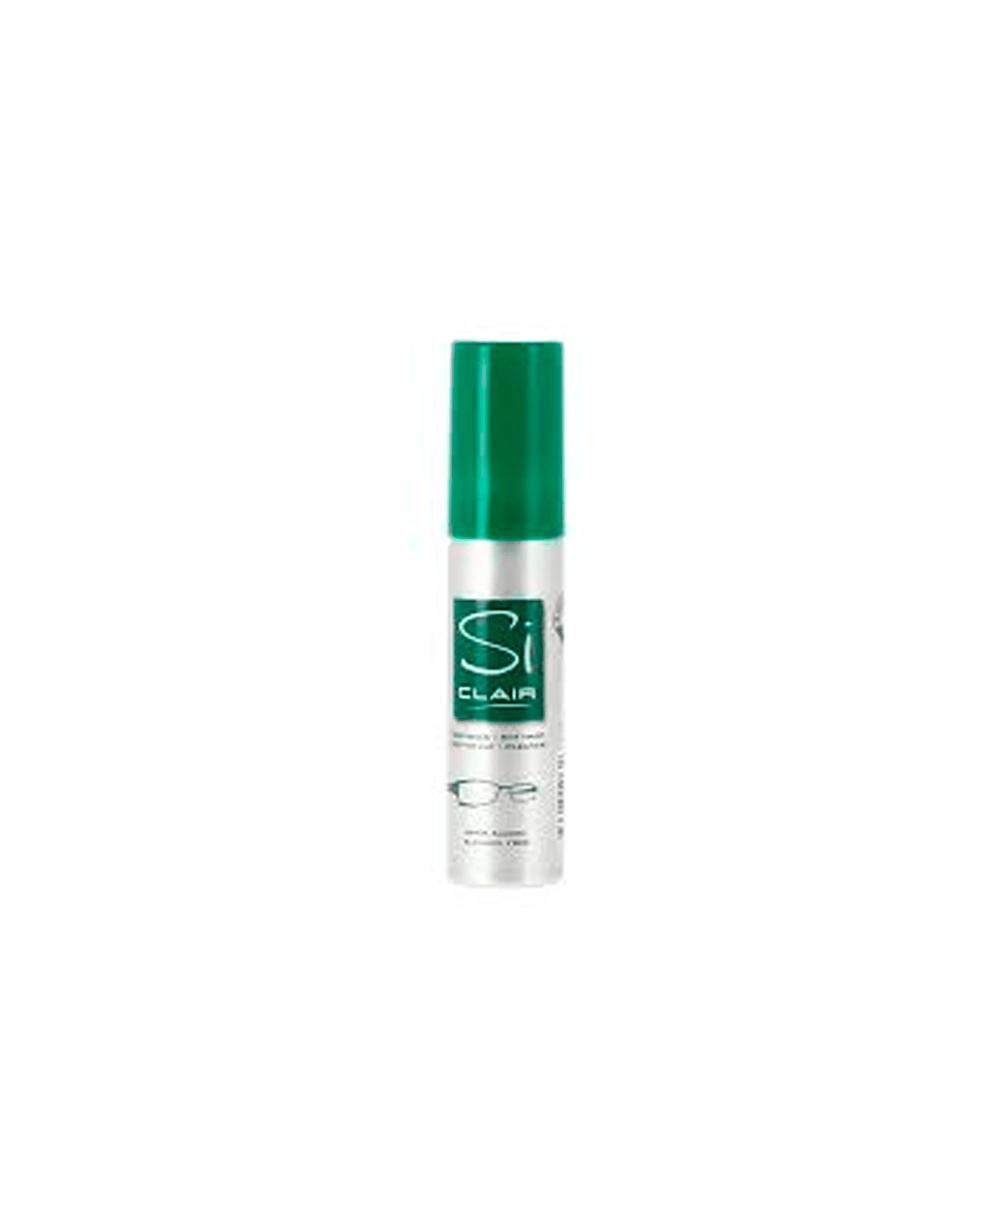 Siclair Spray Gafas Antivaho Tu Cruz Verde